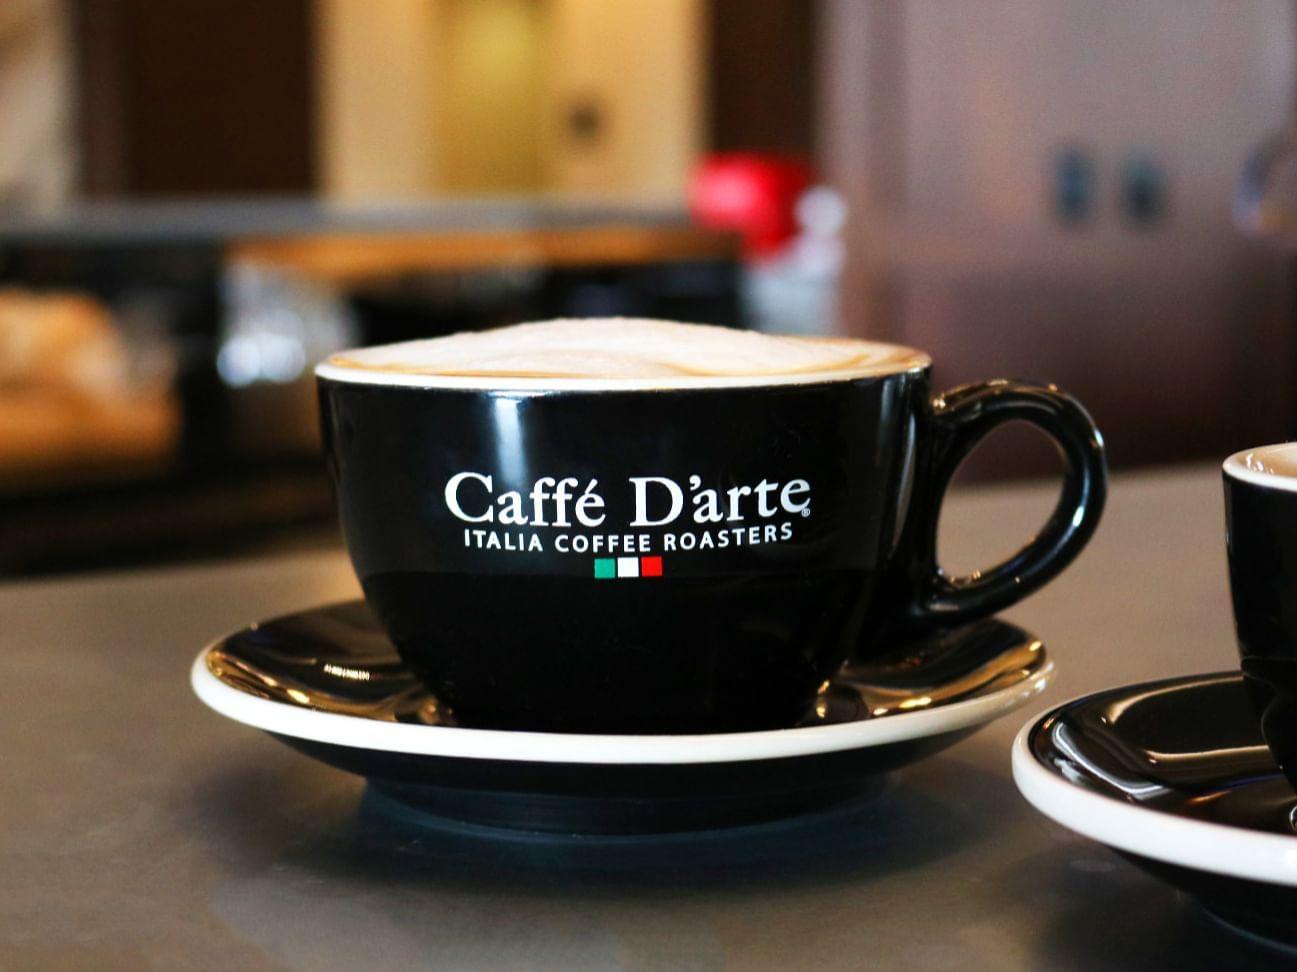 Caffe Darte latte at the Grove Hotel coffee bar